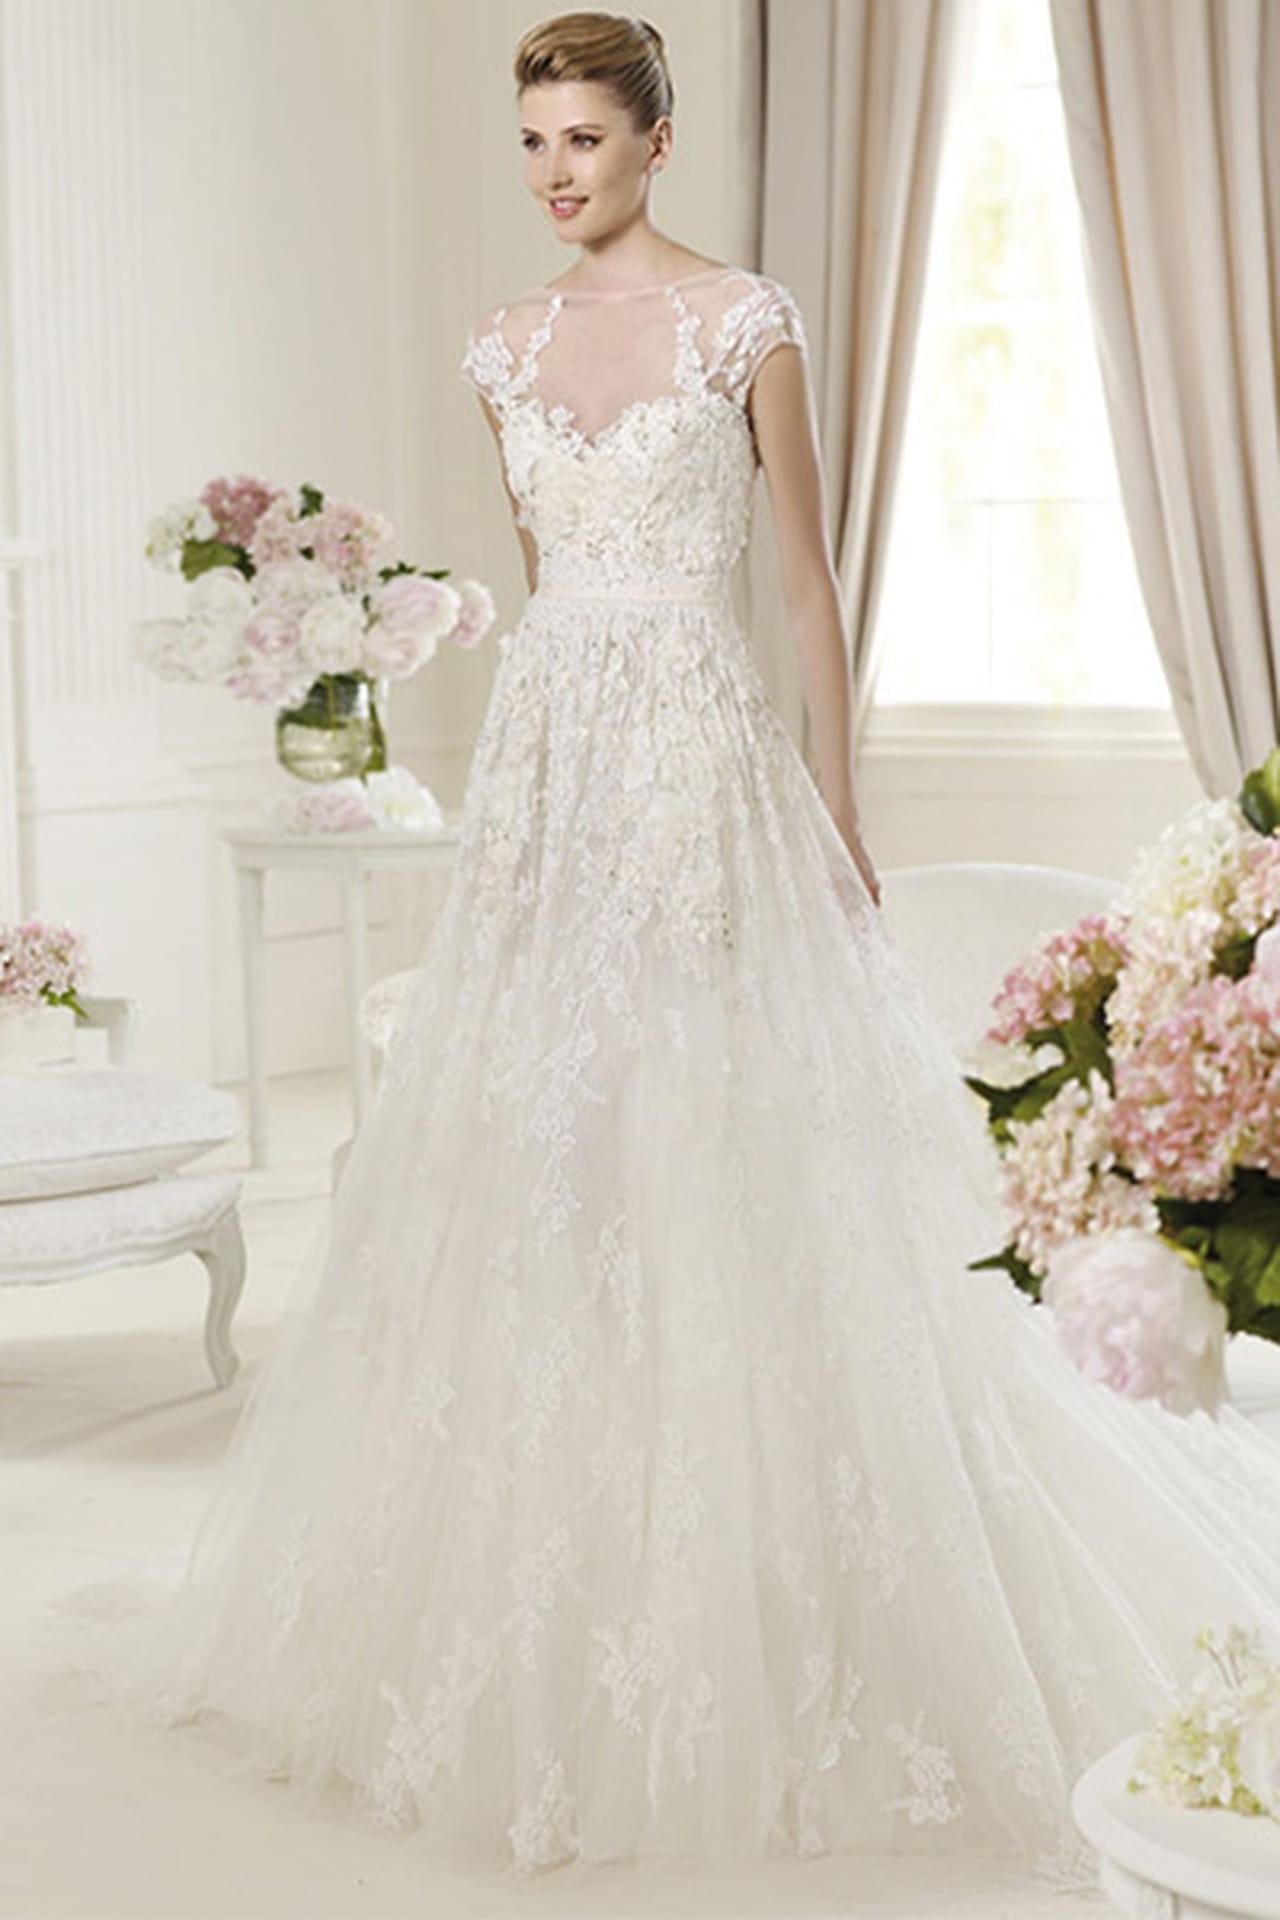 397493eb7 مجموعة فساتين الزفاف من ايلي صعب 2014